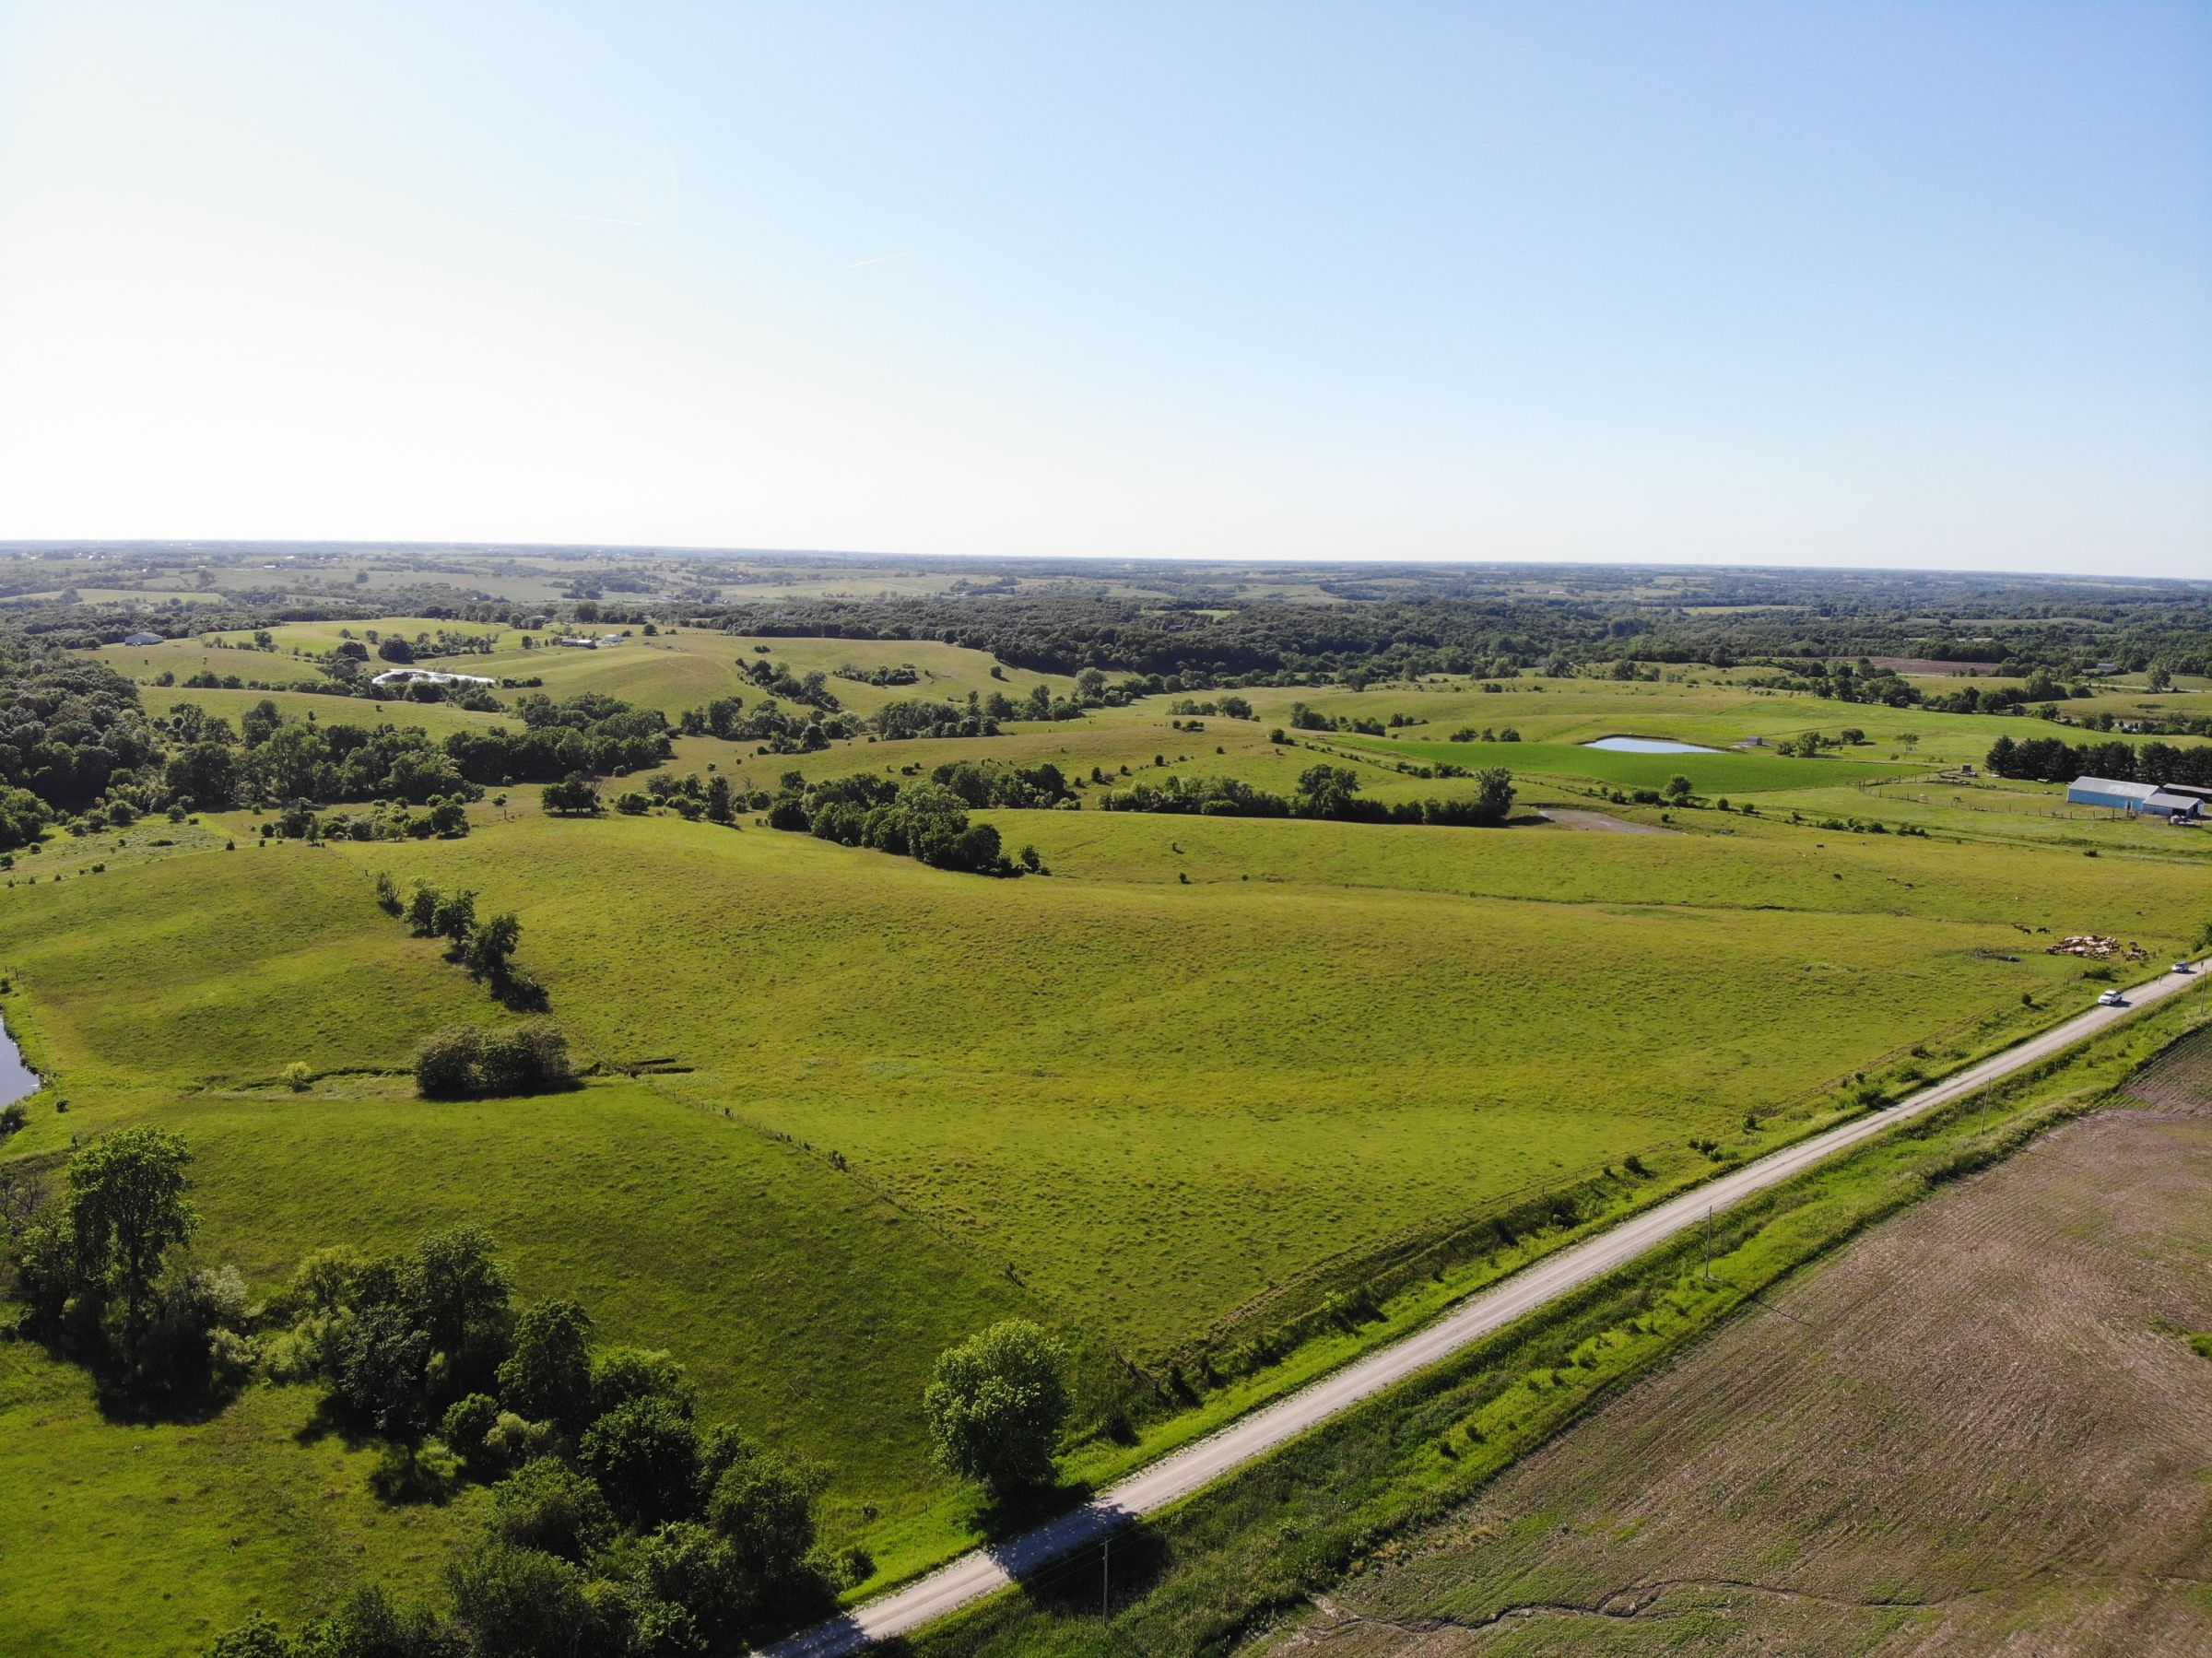 land-warren-county-iowa-20-acres-listing-number-15031-1-2020-06-15-160343.jpg